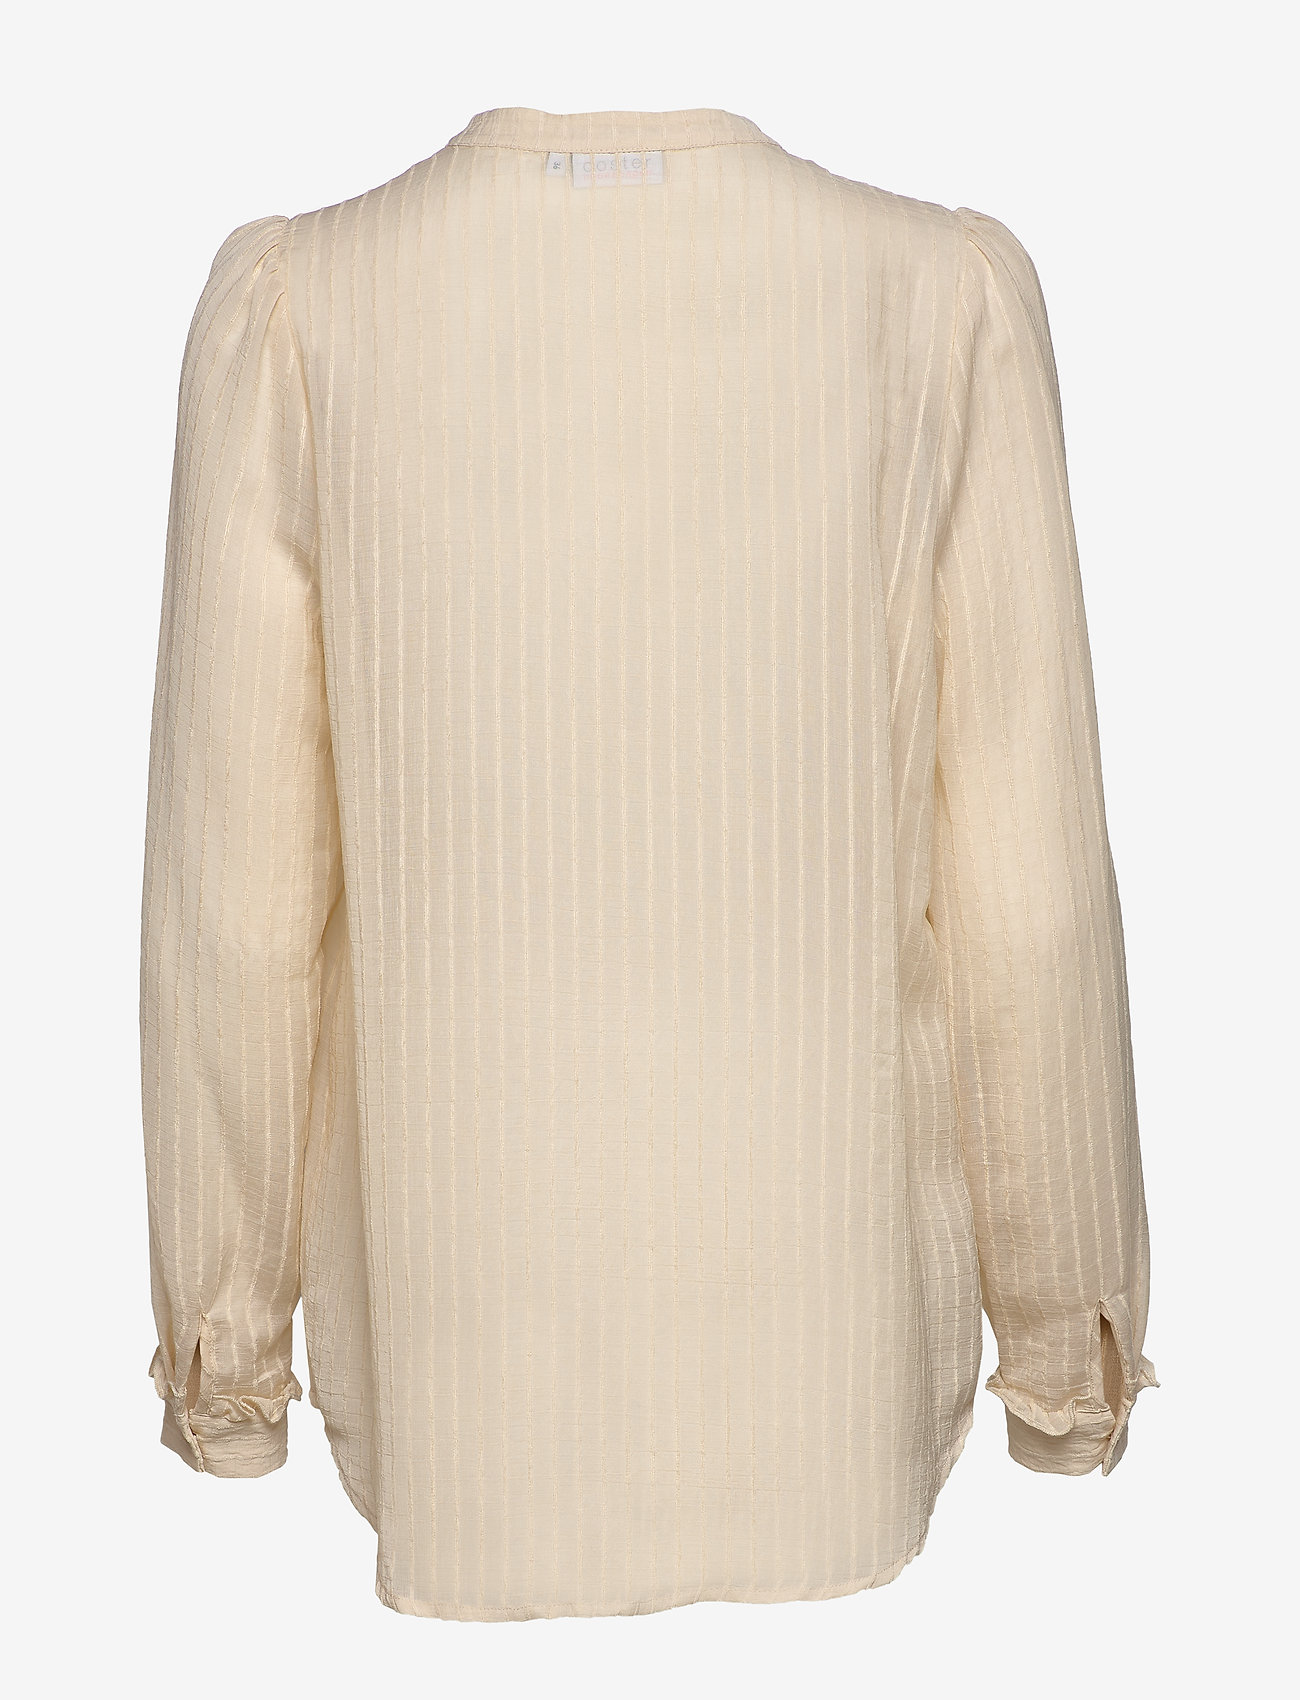 Longsleeved Shirt W. Frill At Cuffs (Corn Cream) (71.20 €) - Coster Copenhagen m2Yrv